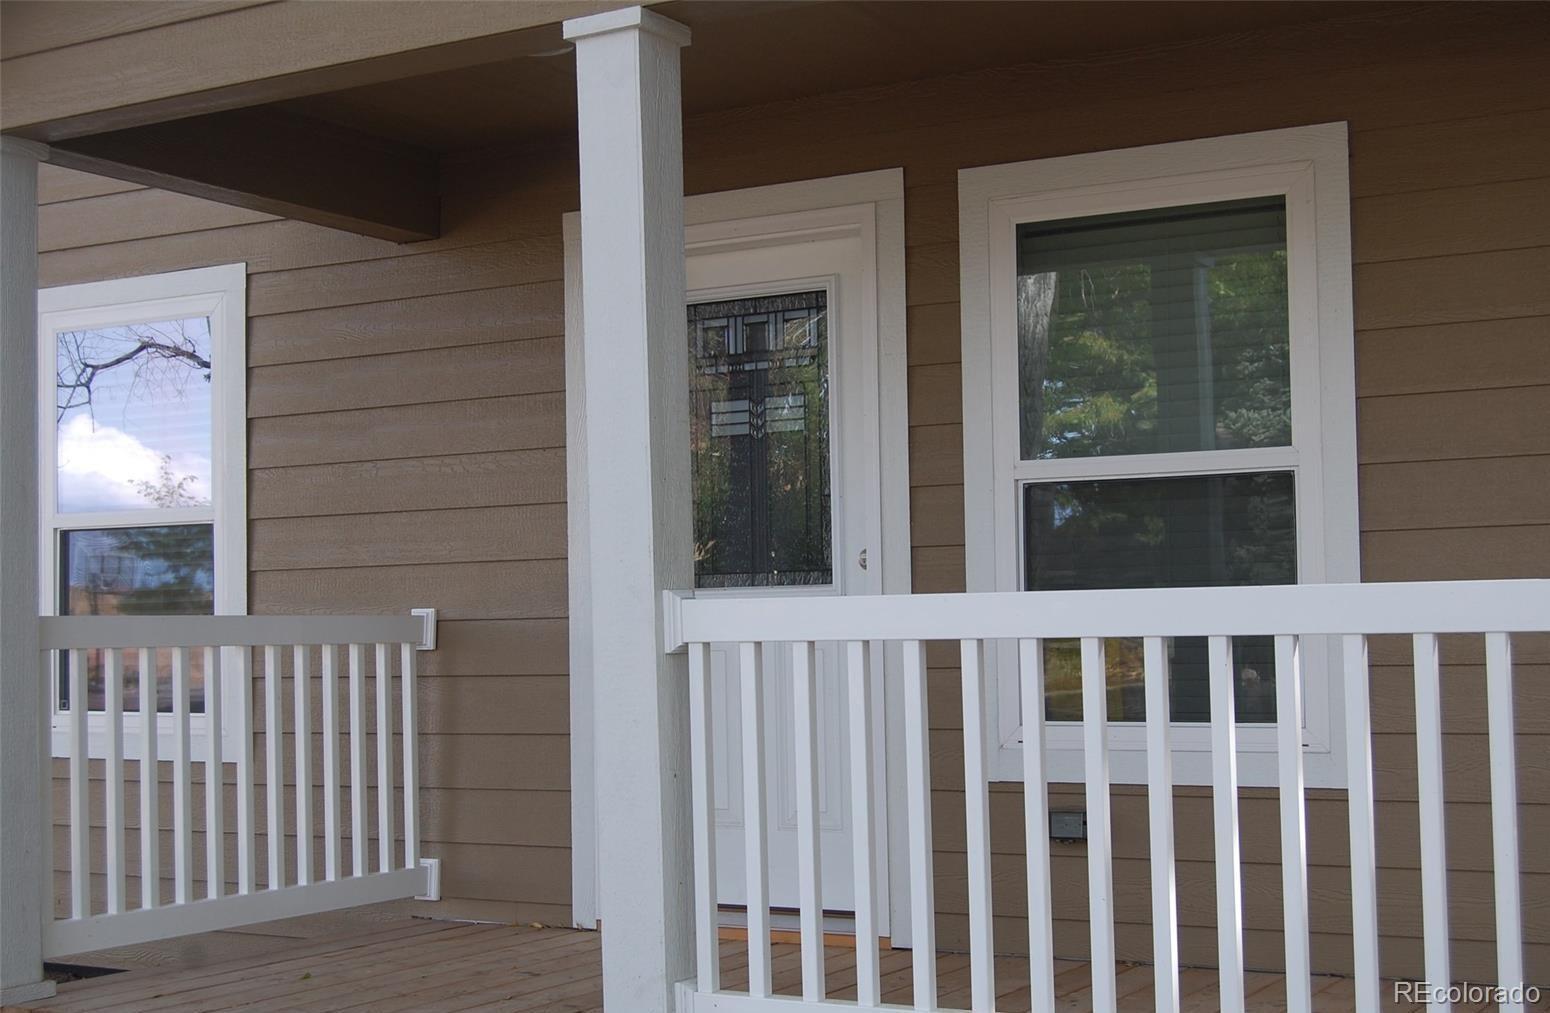 MLS# 9171580 - 3 - 426 Cheyenne Street, Kiowa, CO 80117